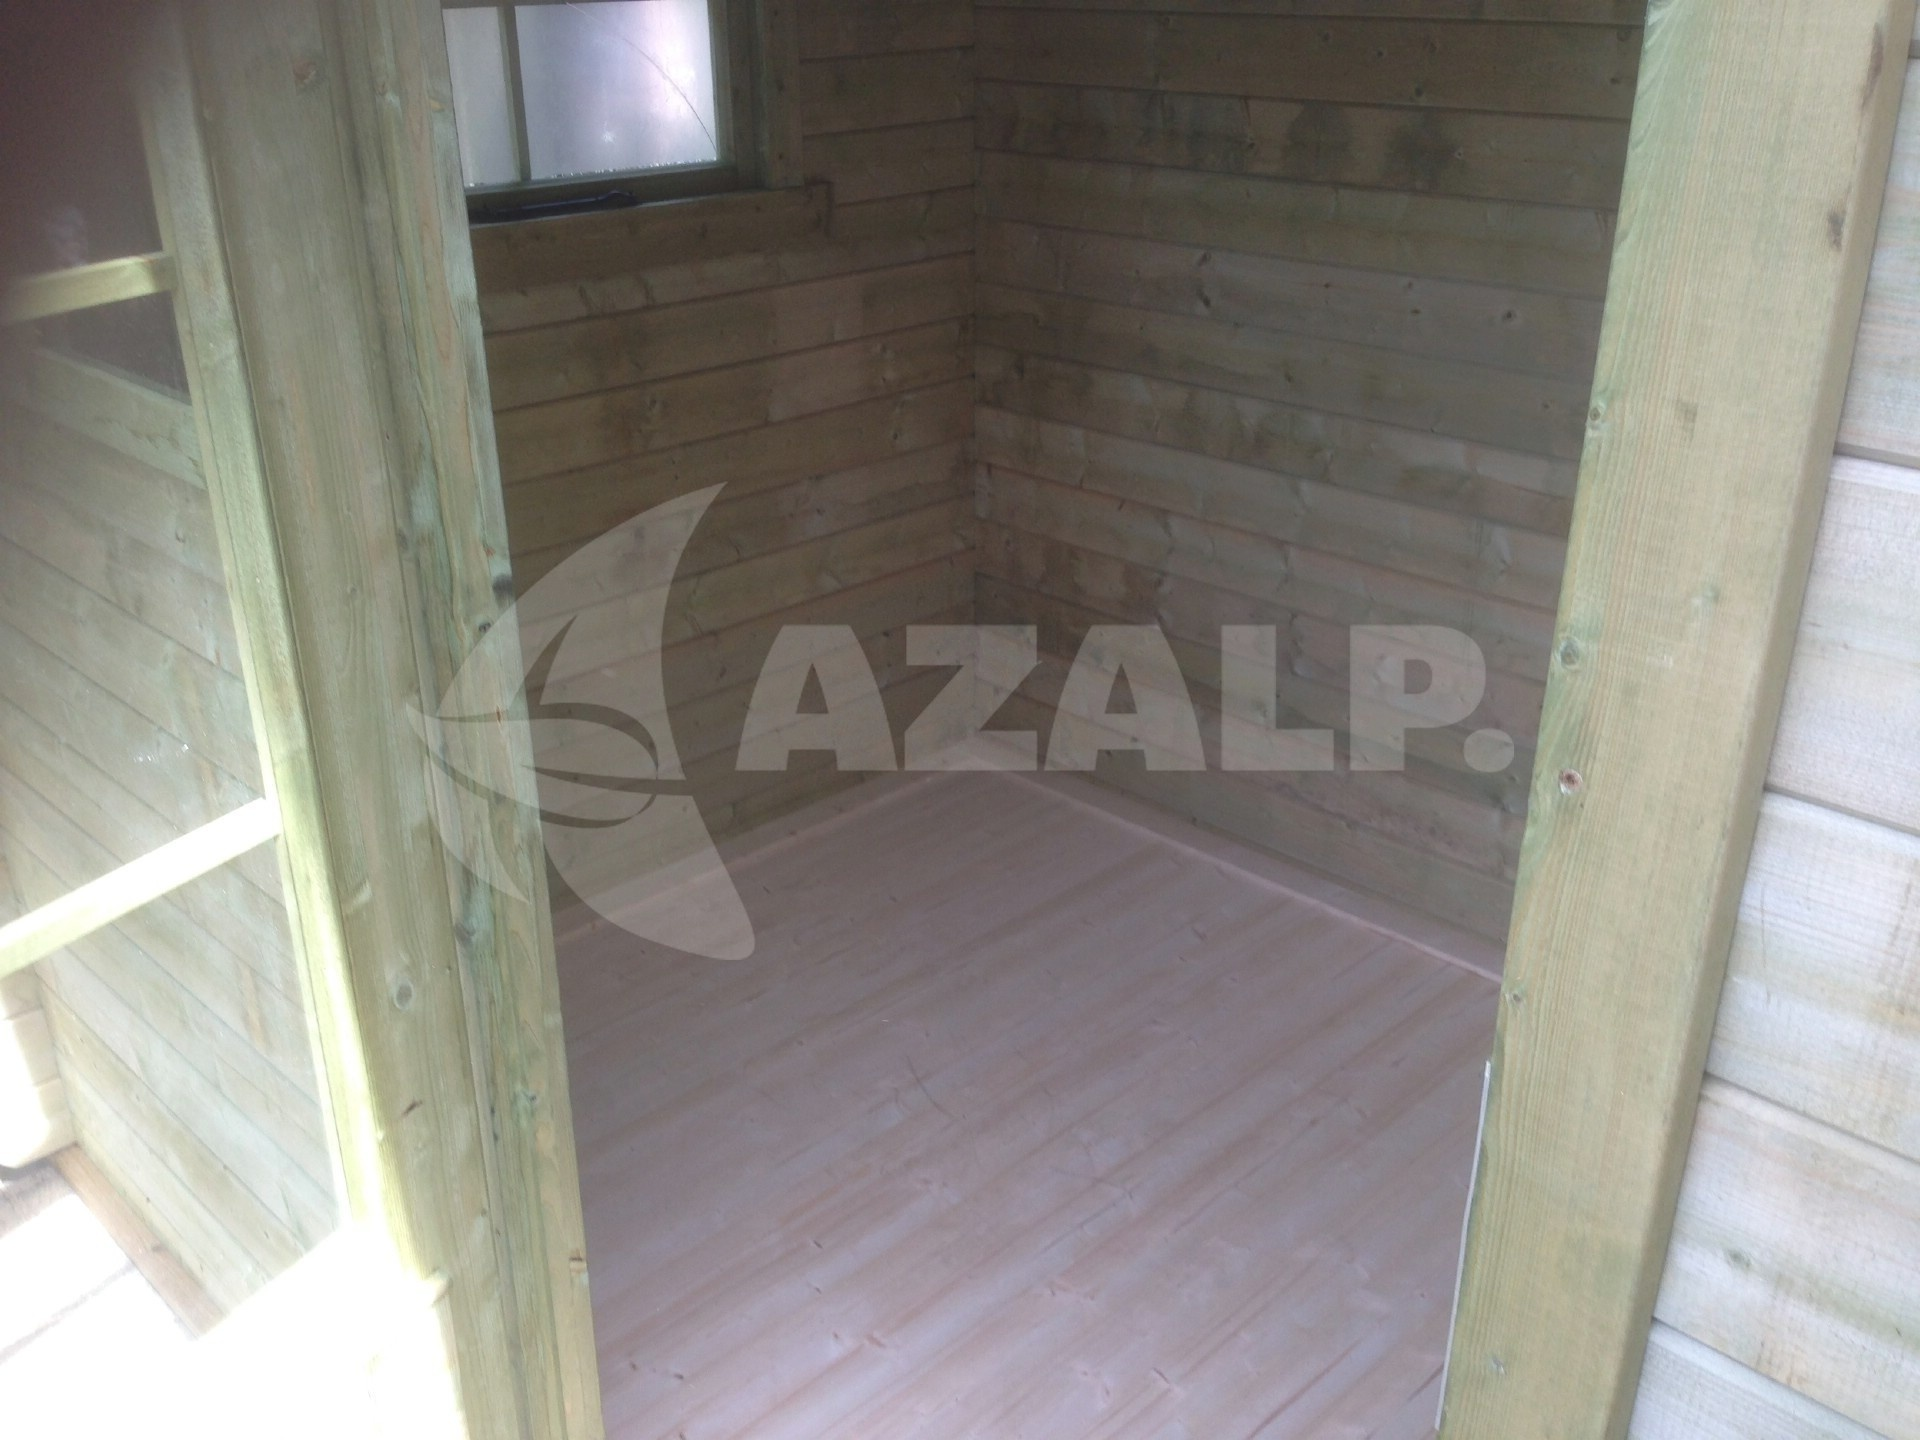 Gartenhaus Mit Fußboden Kaufen ~ Azalp fußboden für gartenhaus kategorie 3 kaufen bei azalp.de